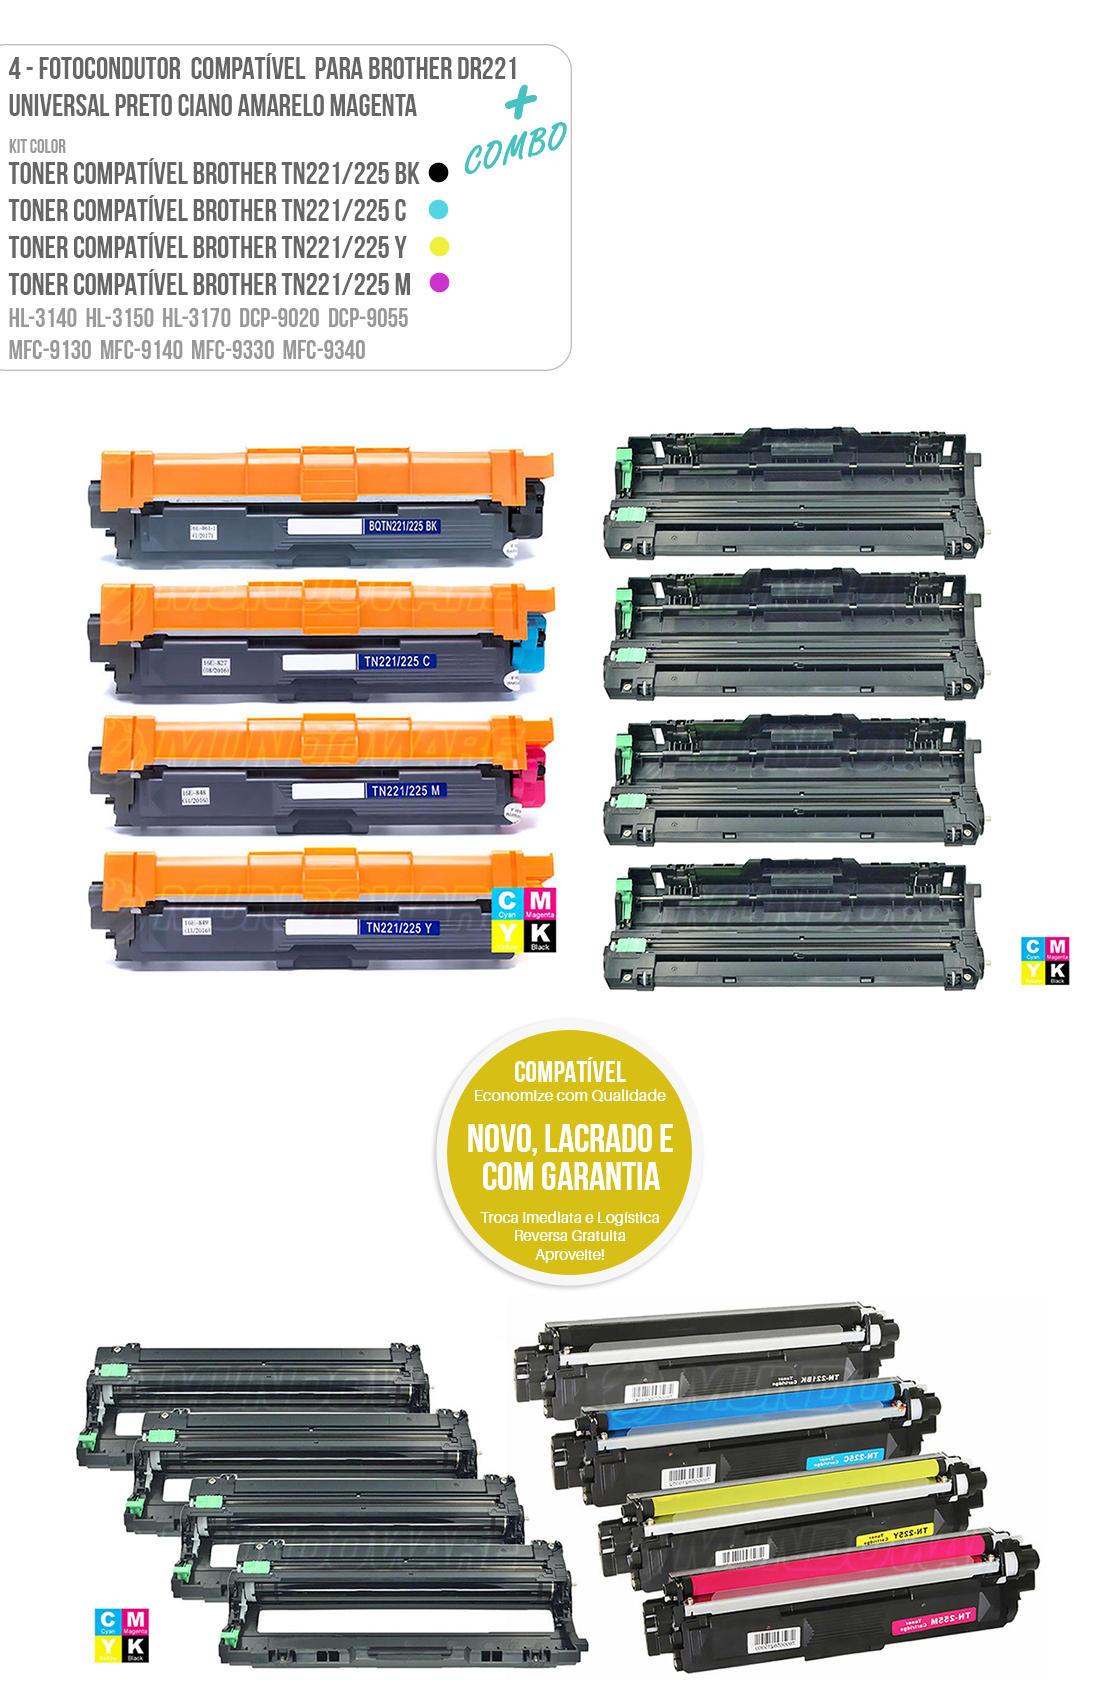 Kit colorido Brother cmybk tn221 tn225 tonner tn225 tn-225 + 4 peças Fotocondutores DR221 para impressora HL3140 HL3150 HL3170 DCP9020 DCP9055